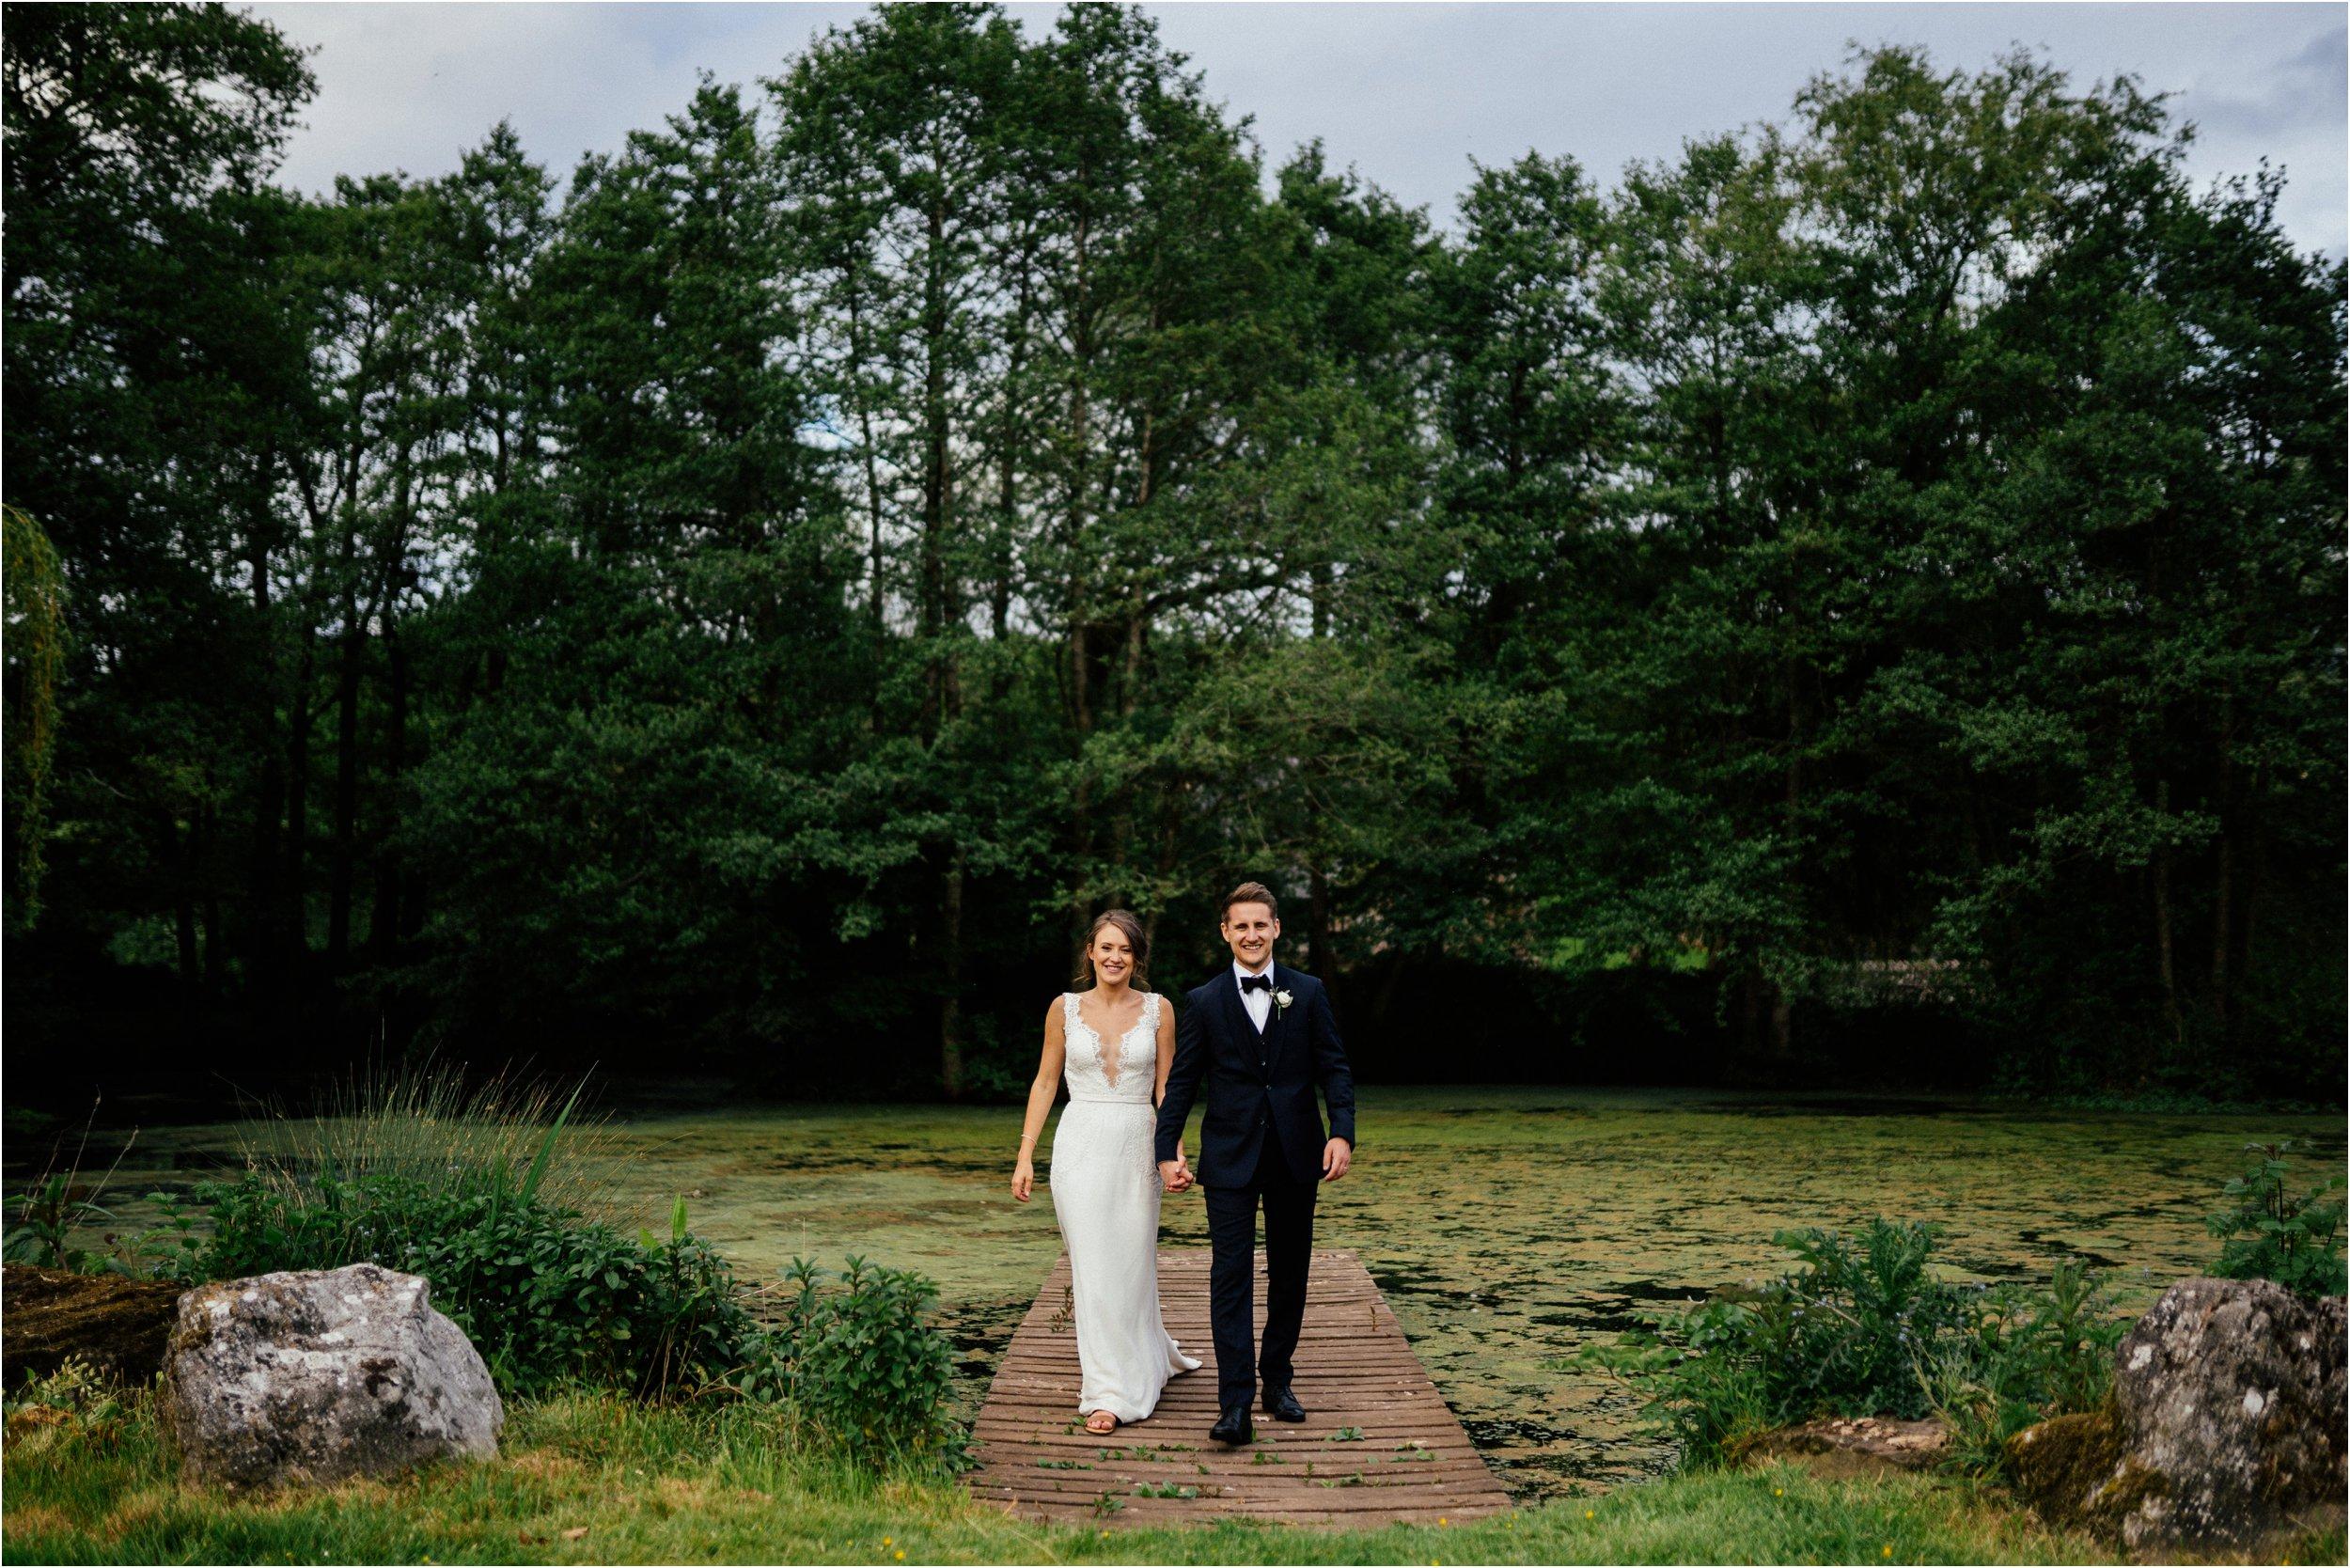 Dewsall Court Herefordshire wedding photographer_0131.jpg